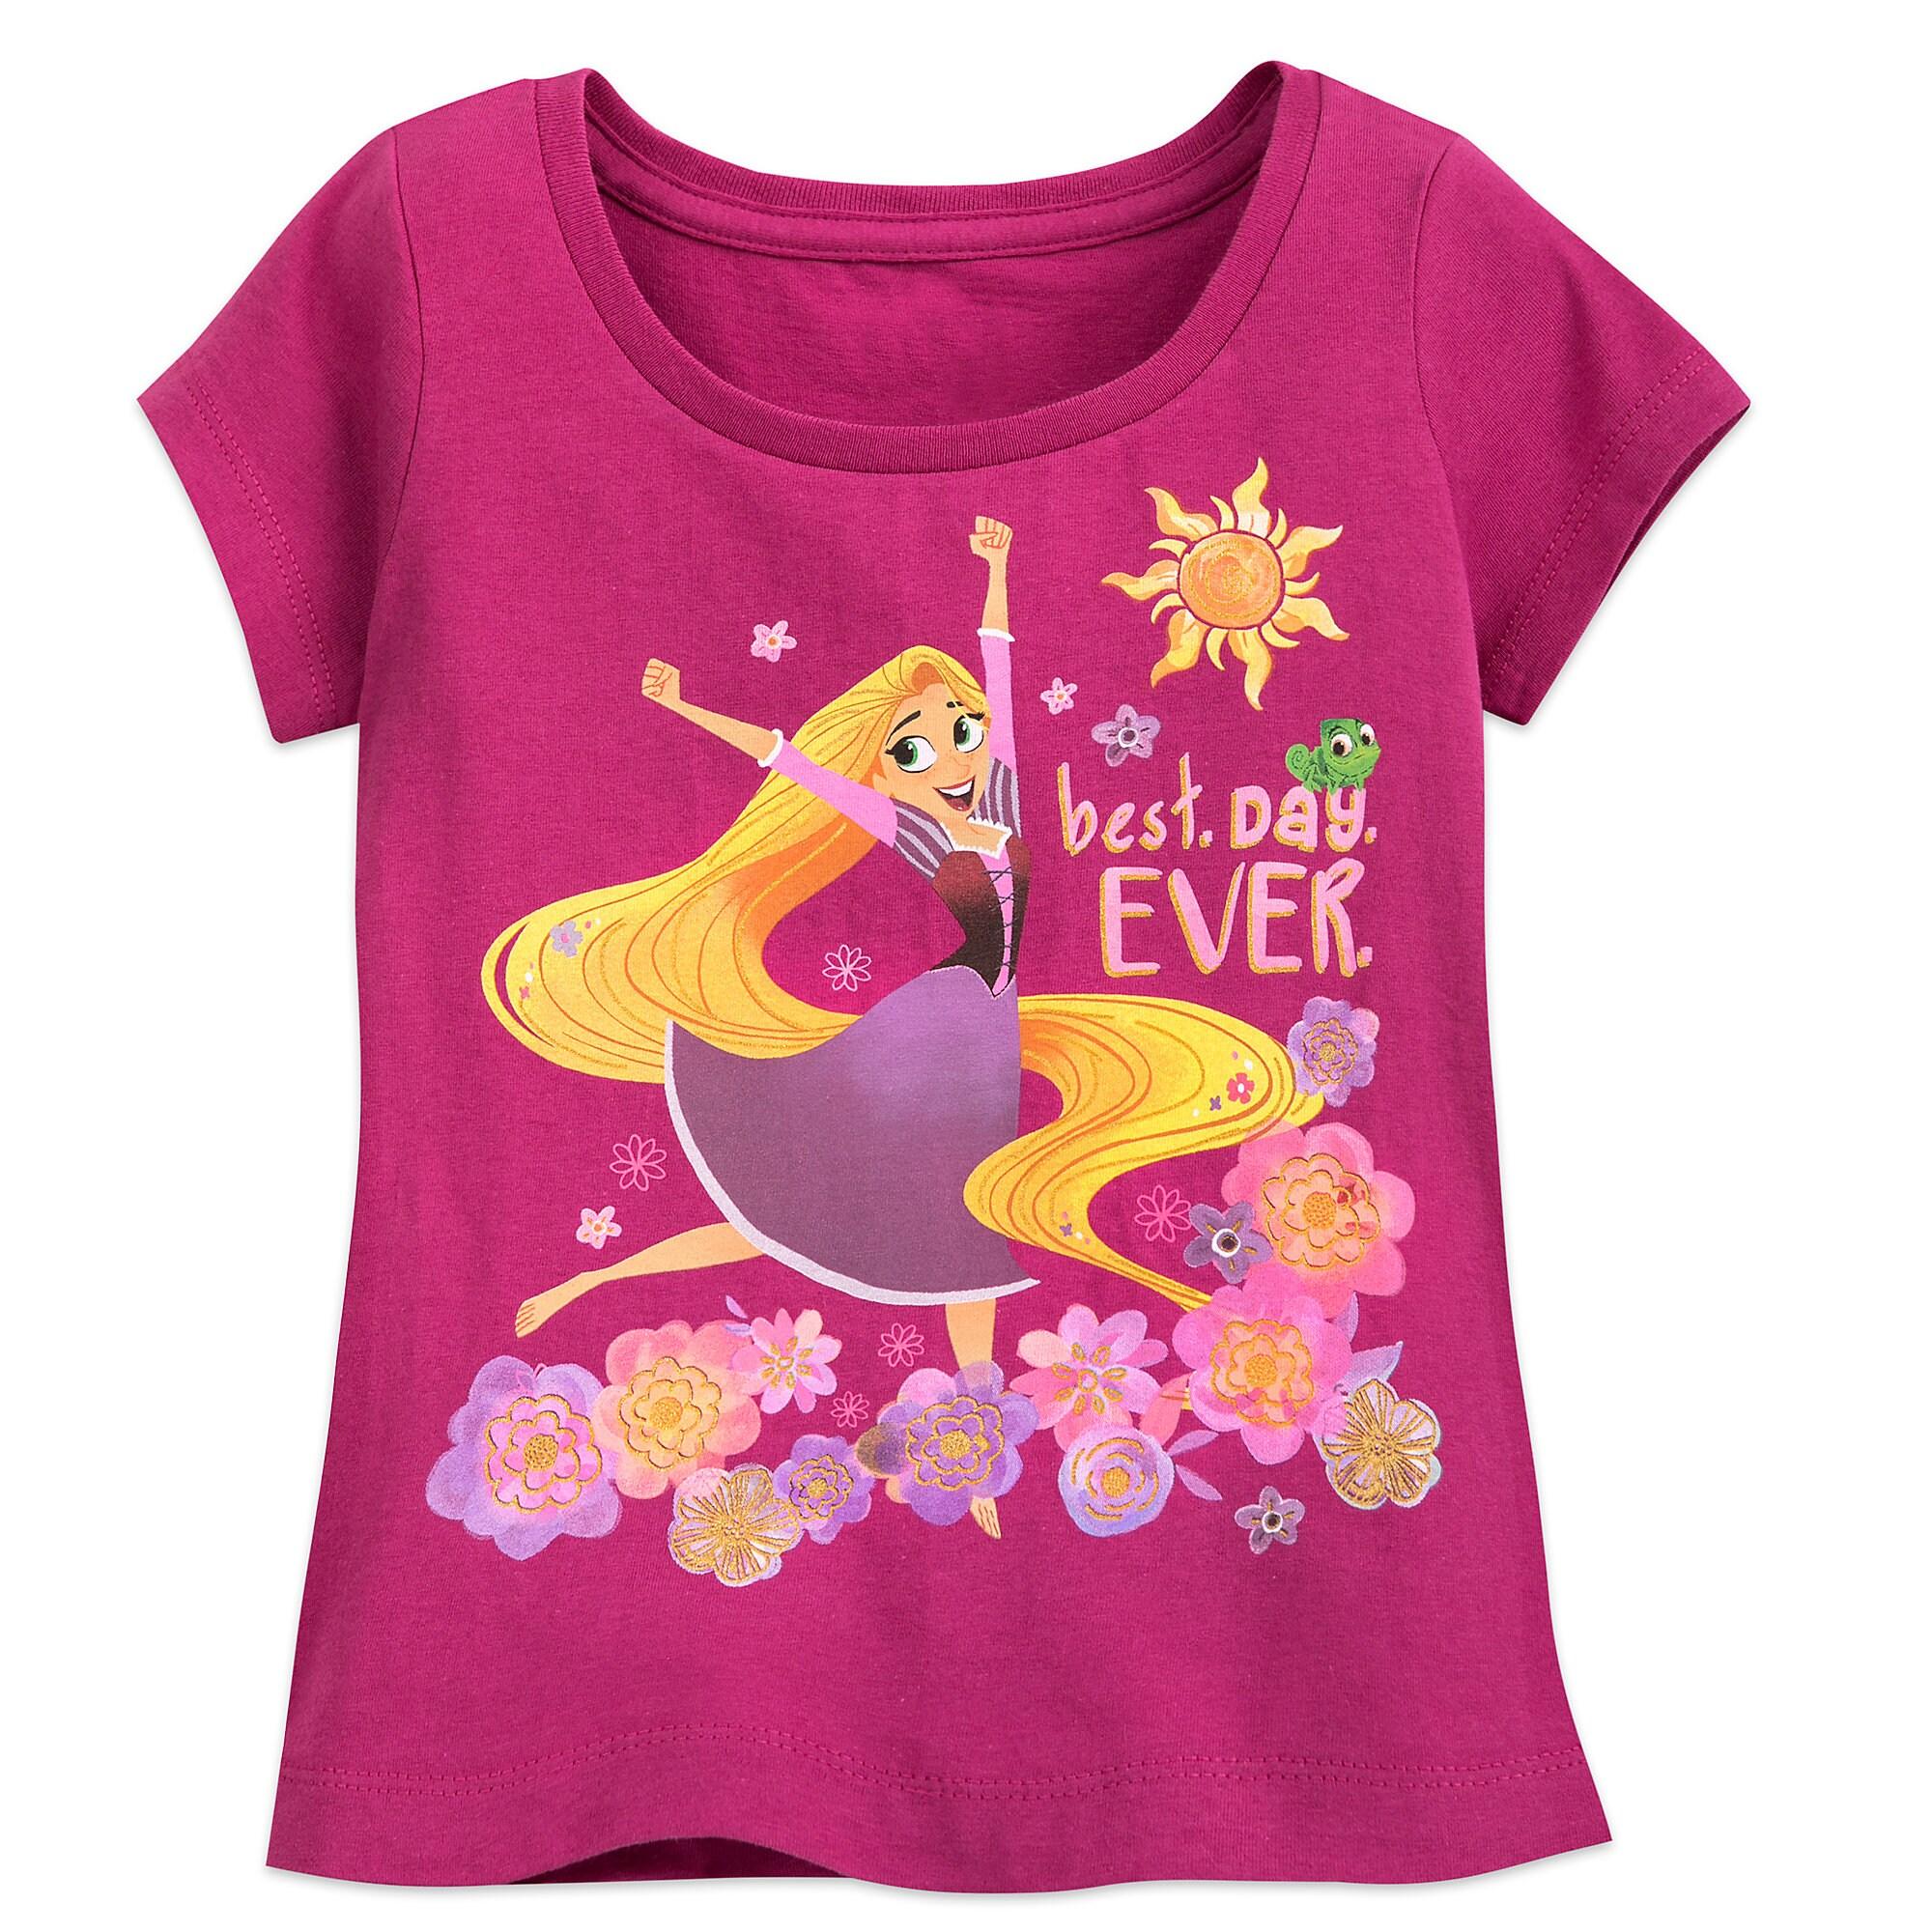 Rapunzel T-Shirt for Girls - Tangled: The Series